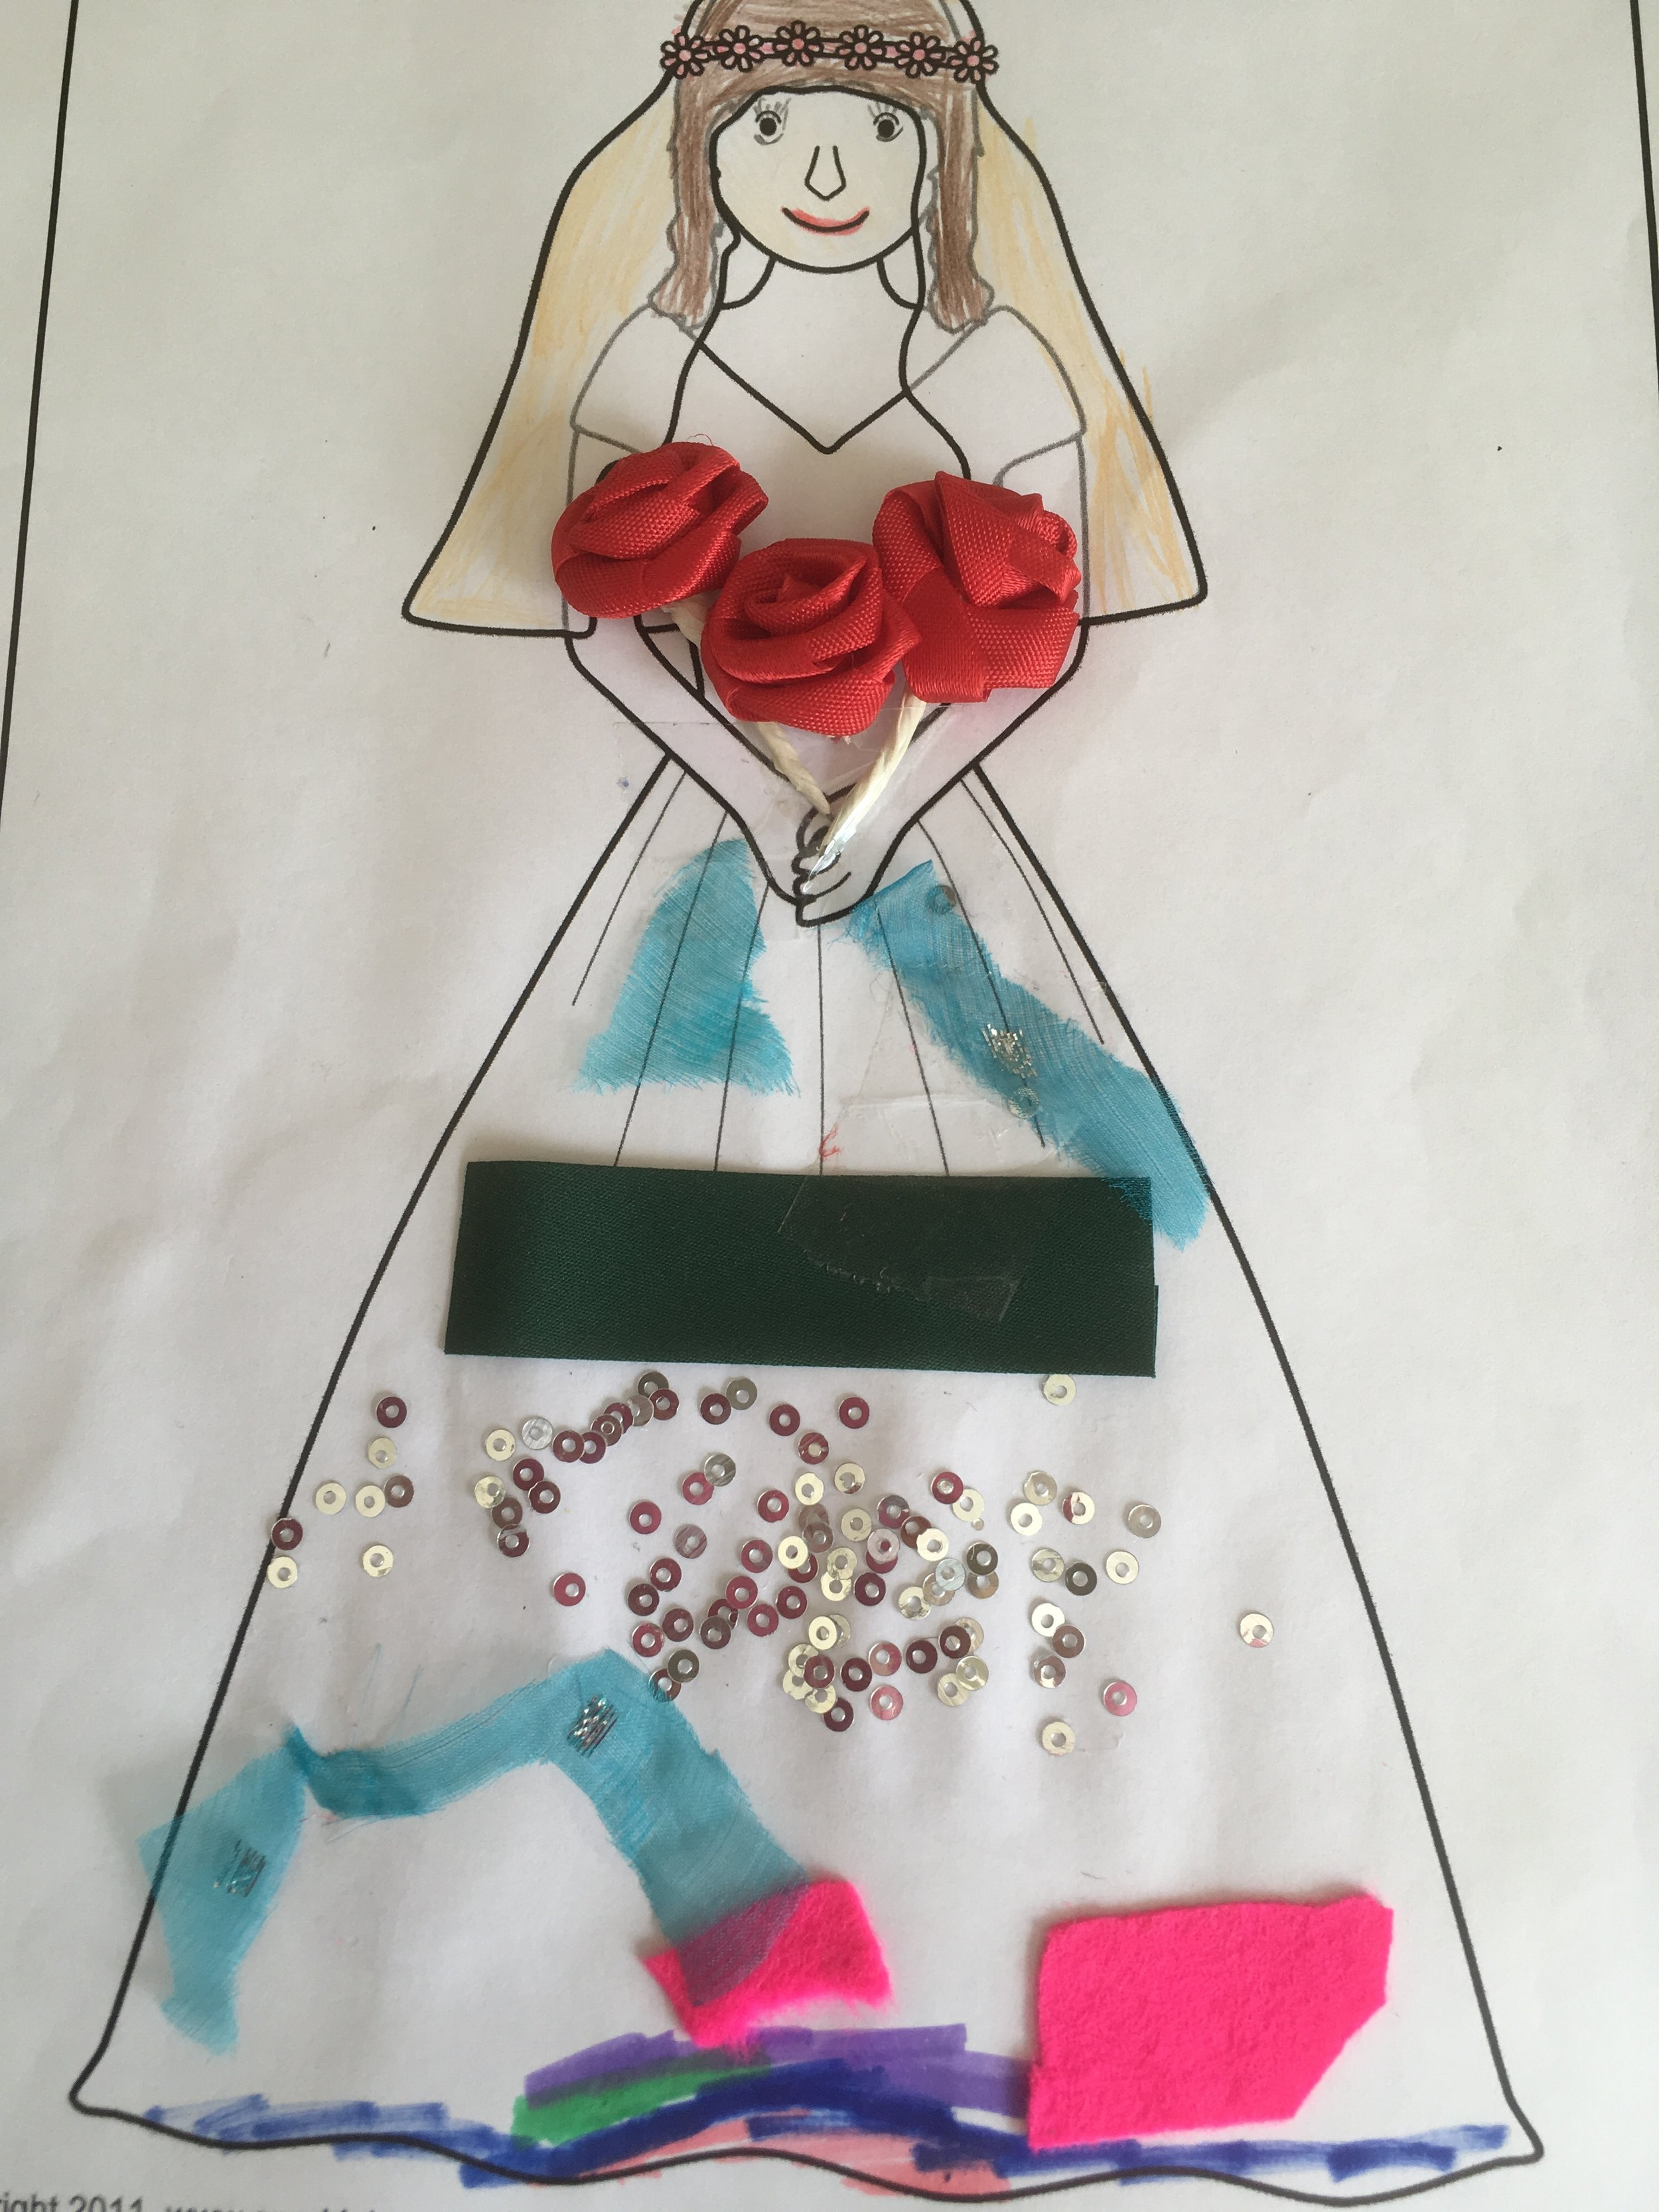 Meghans wedding dress